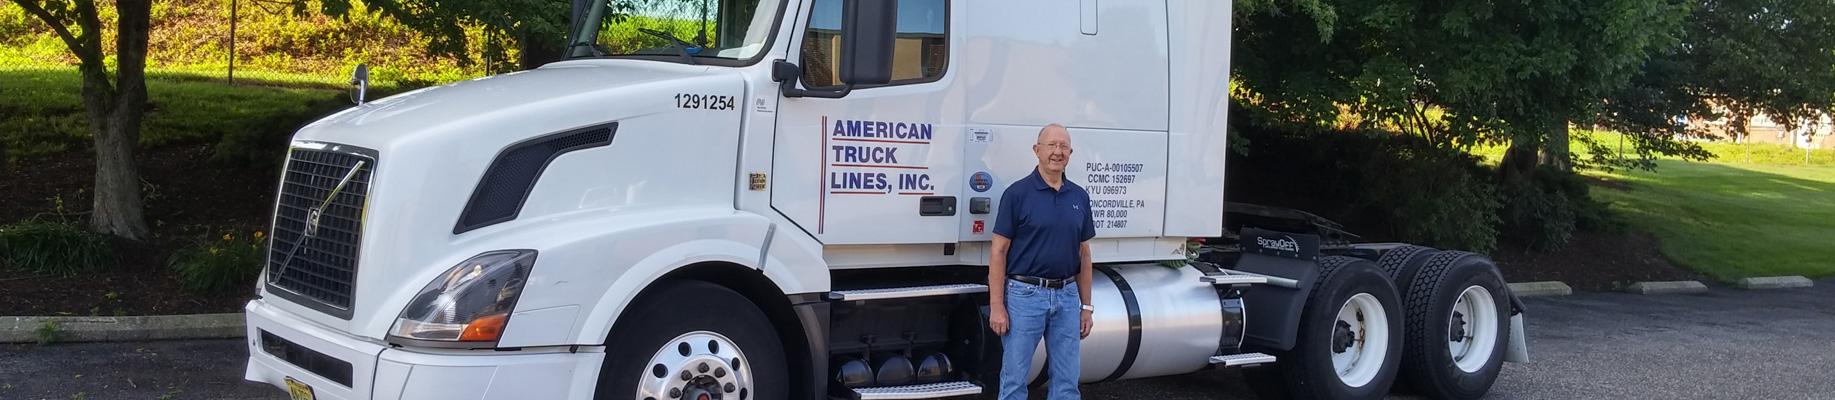 American Truck Lines